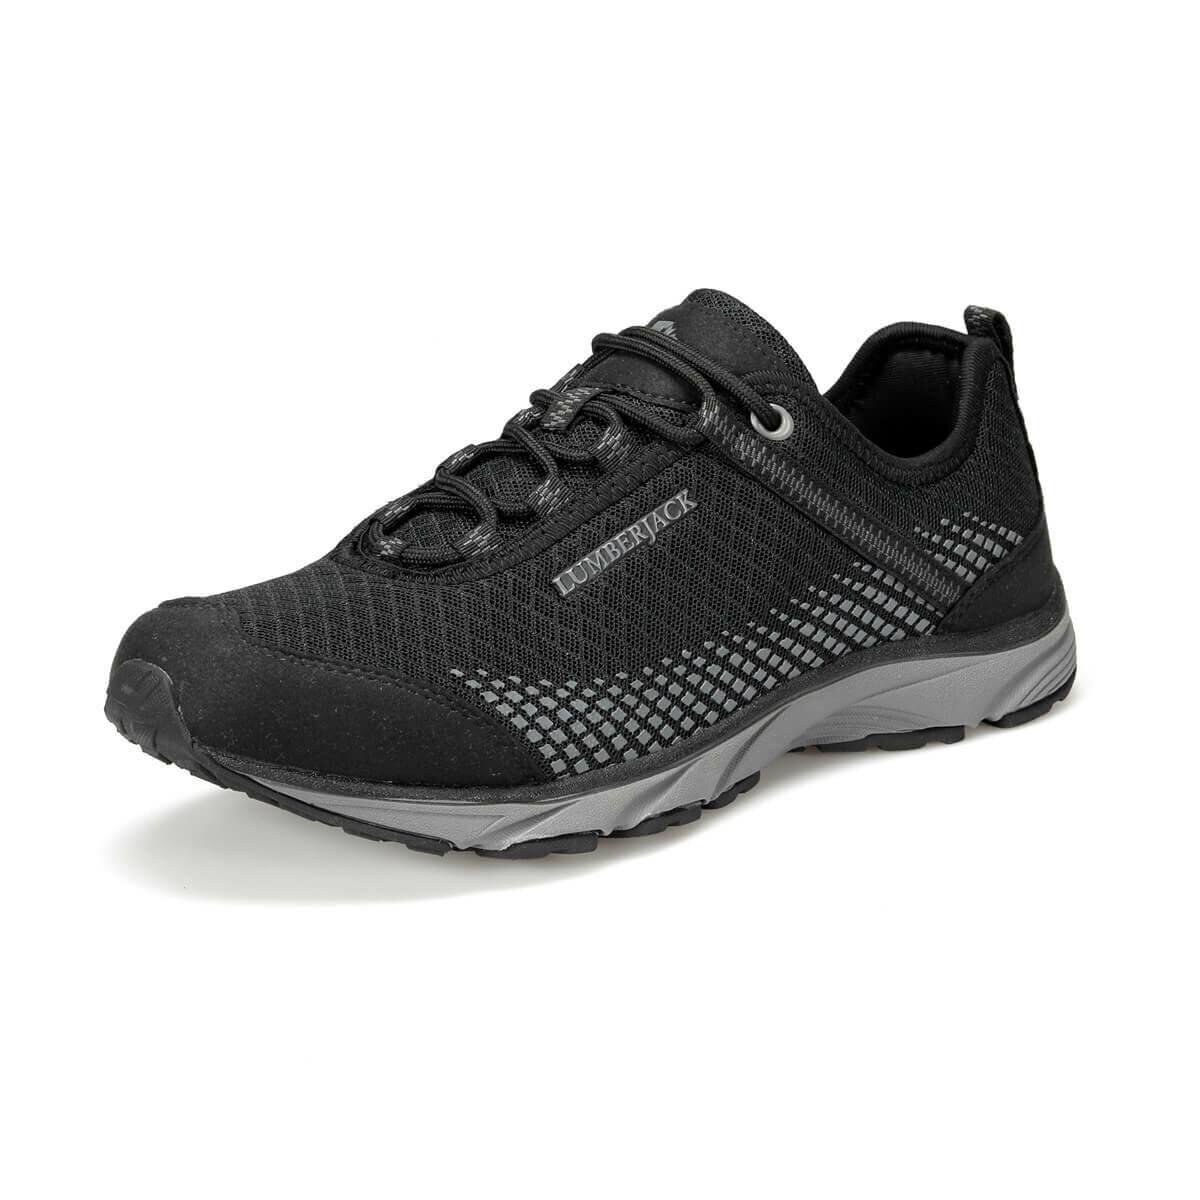 FLO DARE 9PR Black Men 'S Running Shoe LUMBERJACK